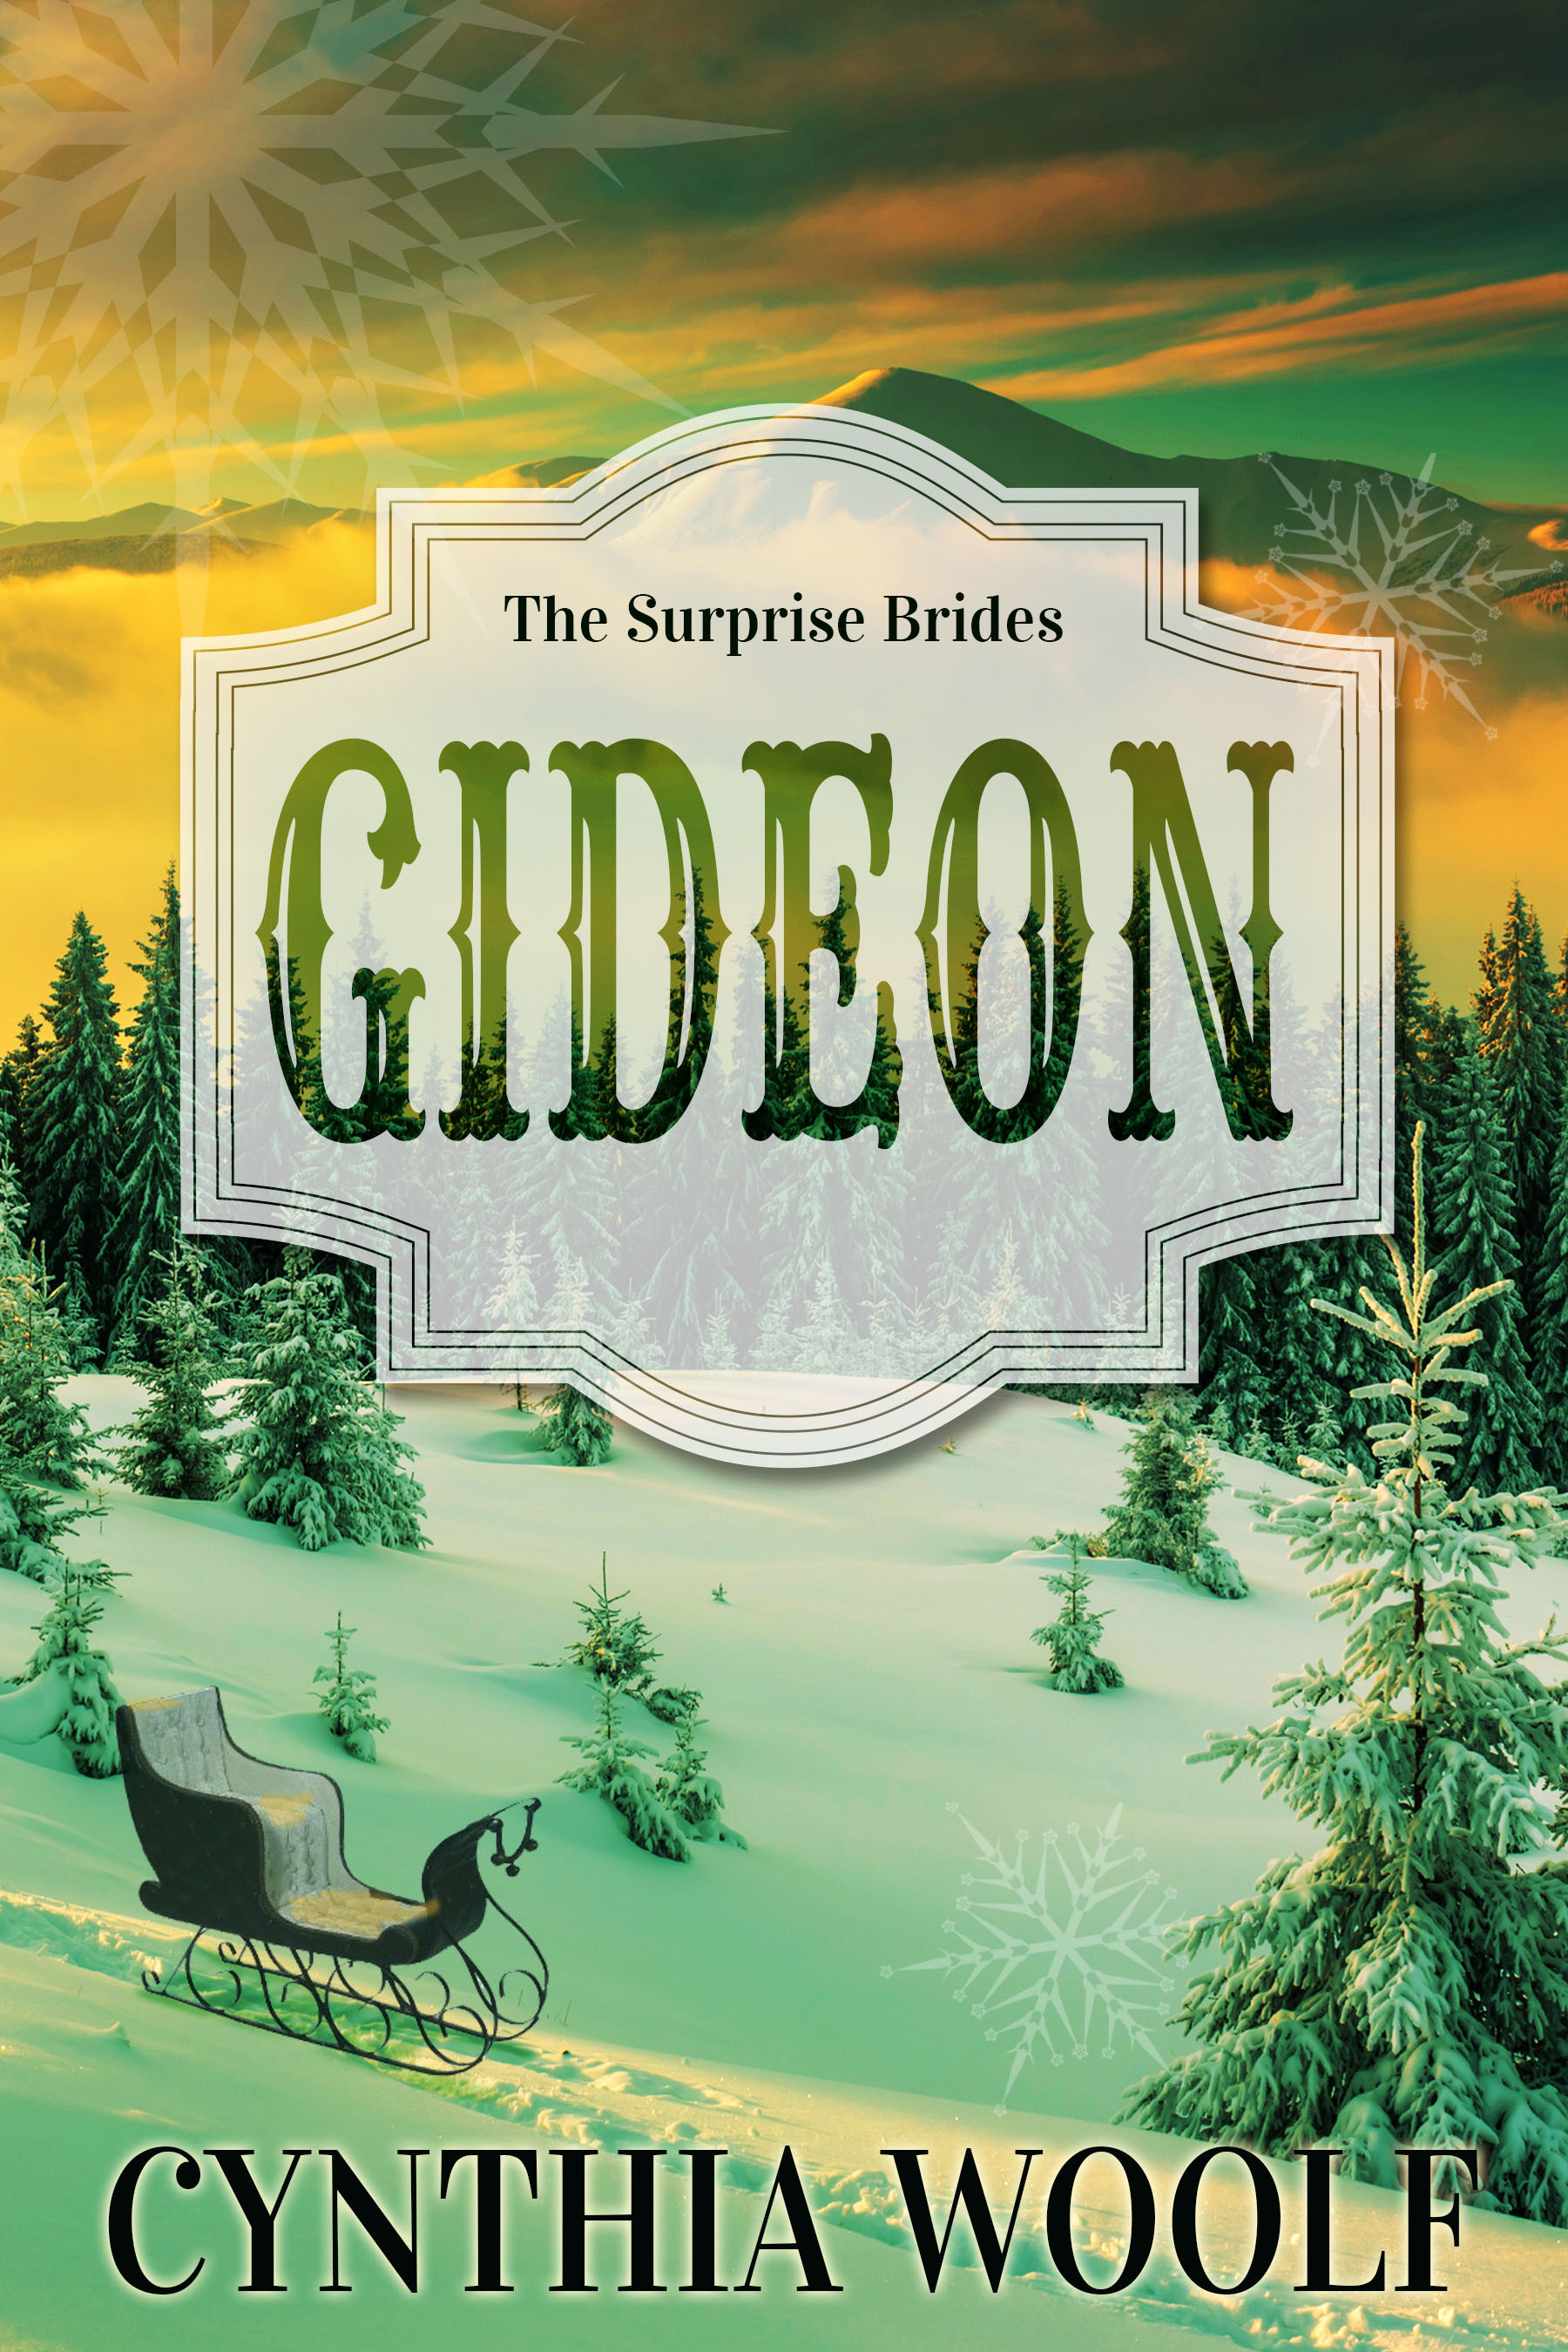 Gideon (The Surprise Brides #3) Cynthia Woolf